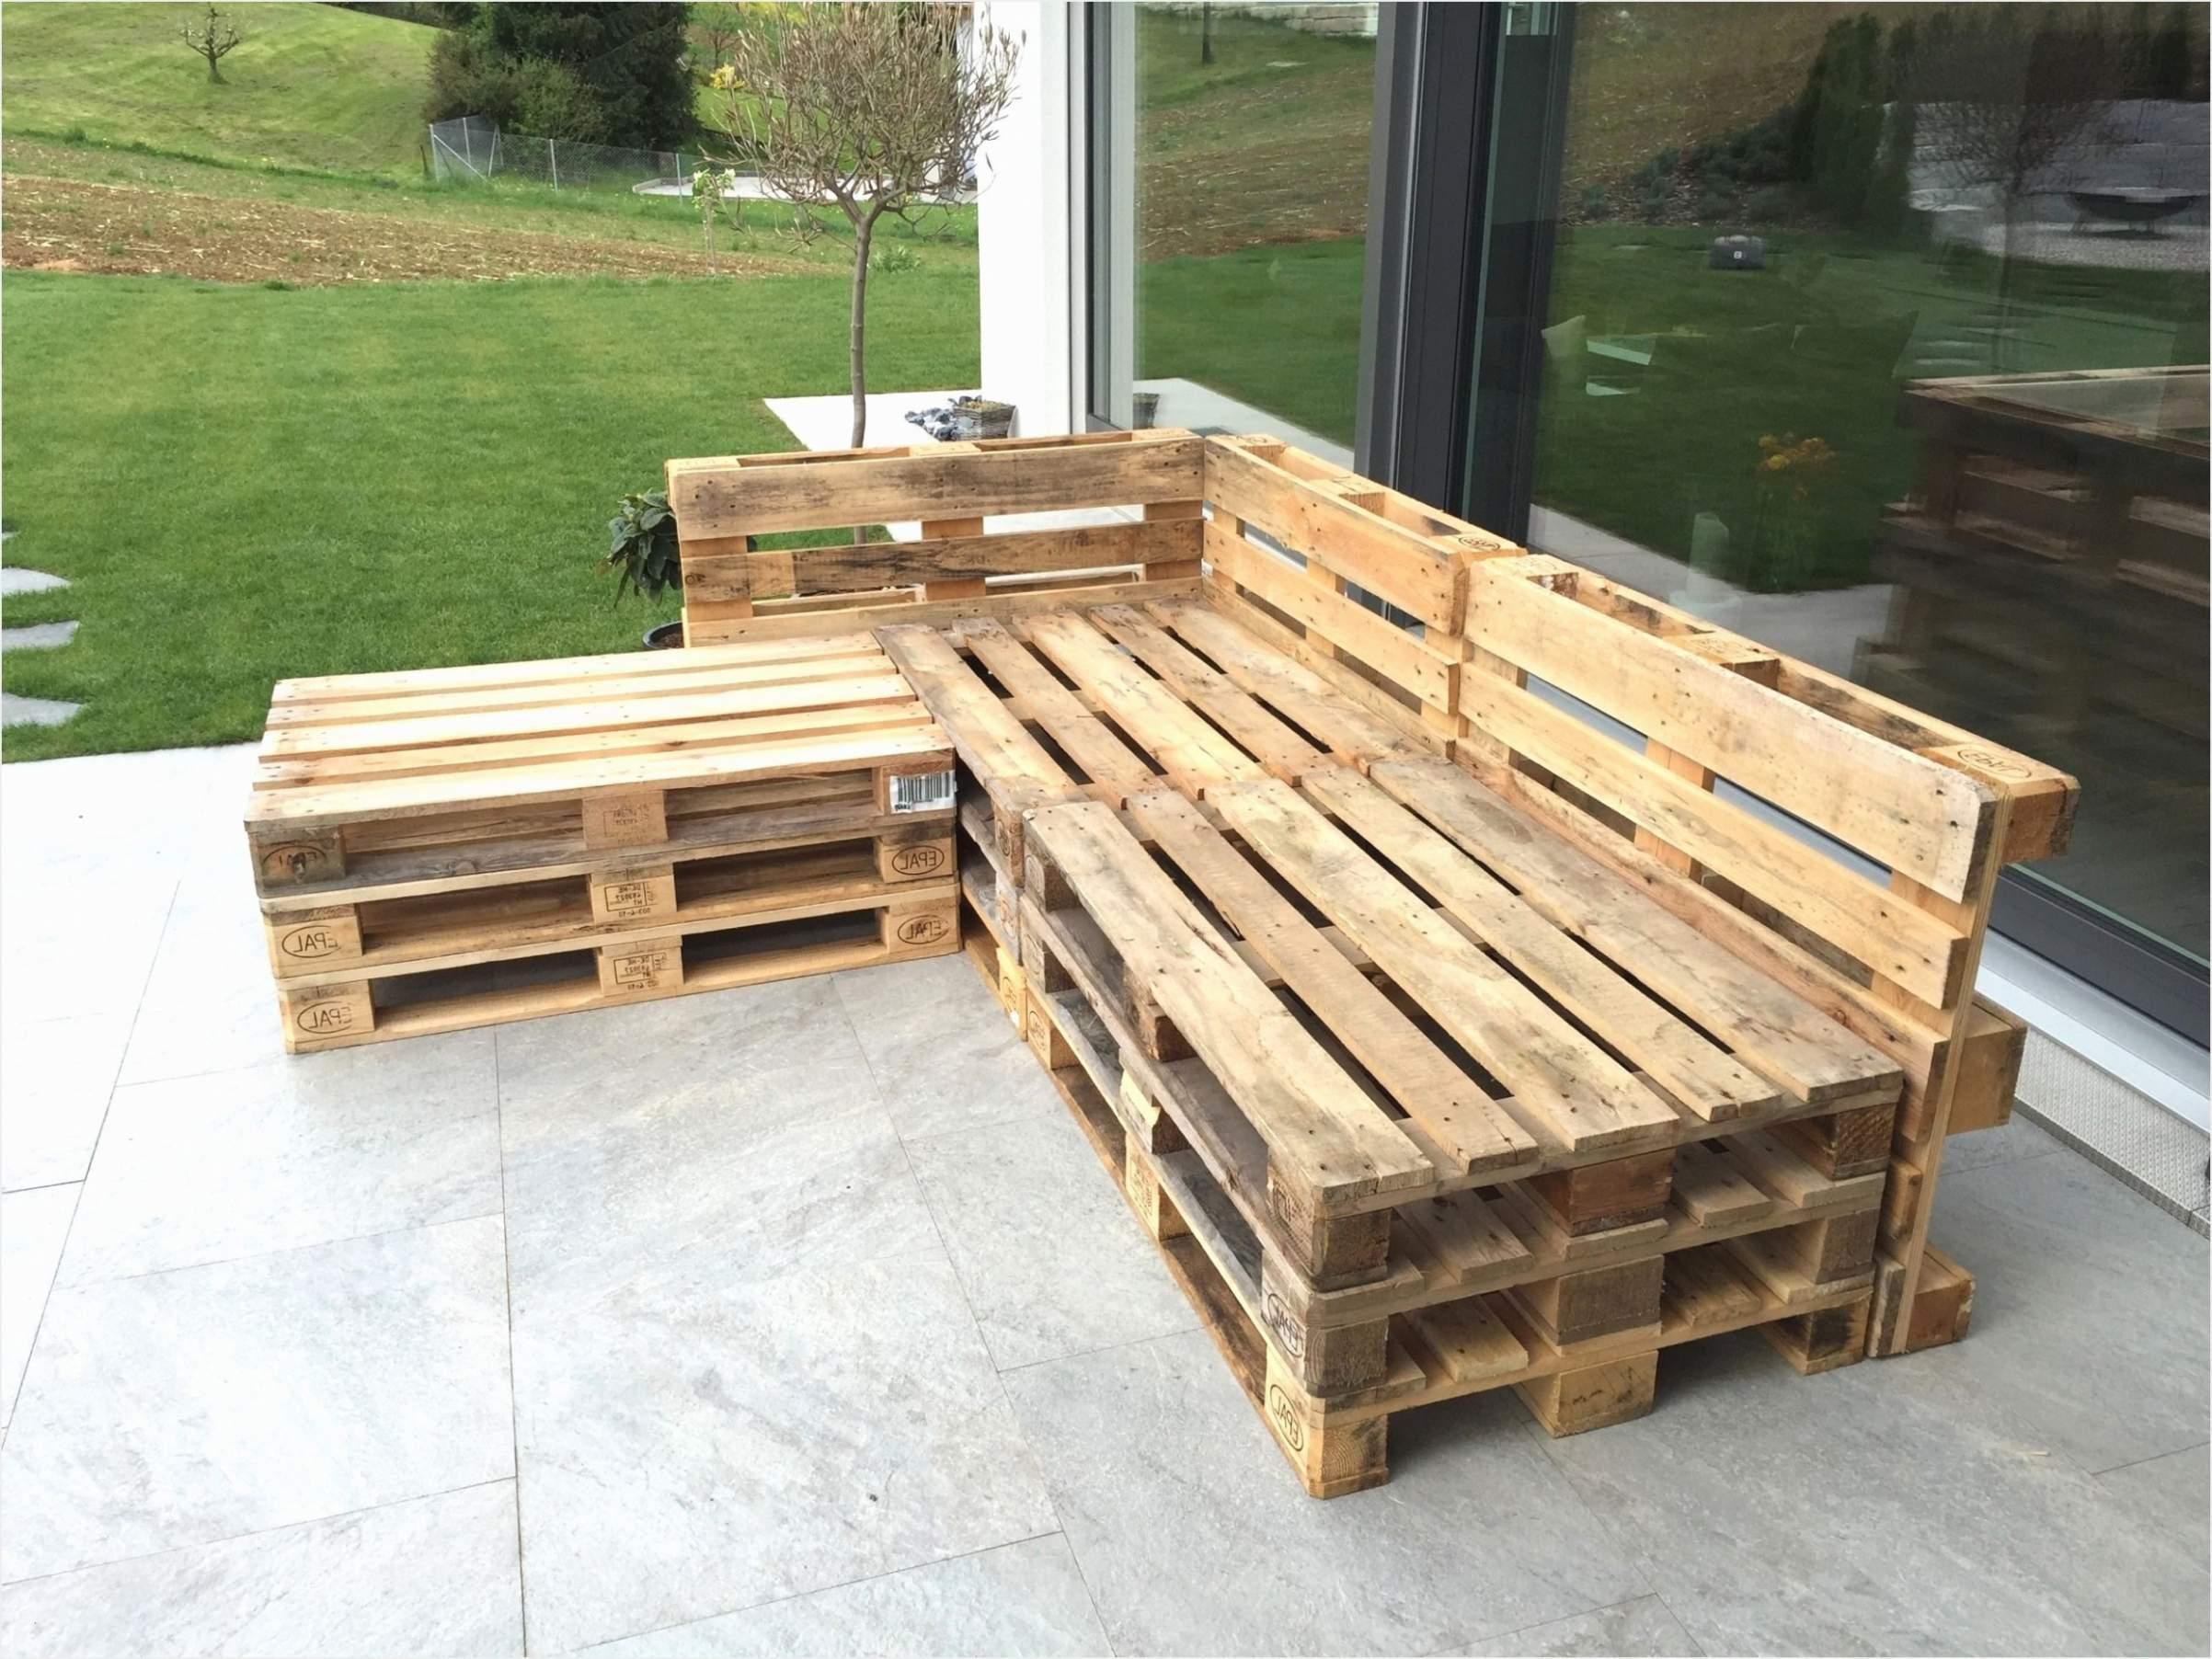 lounge mobel selber bauen yct projekte lounge mobel selber bauen lounge mobel selber bauen 3